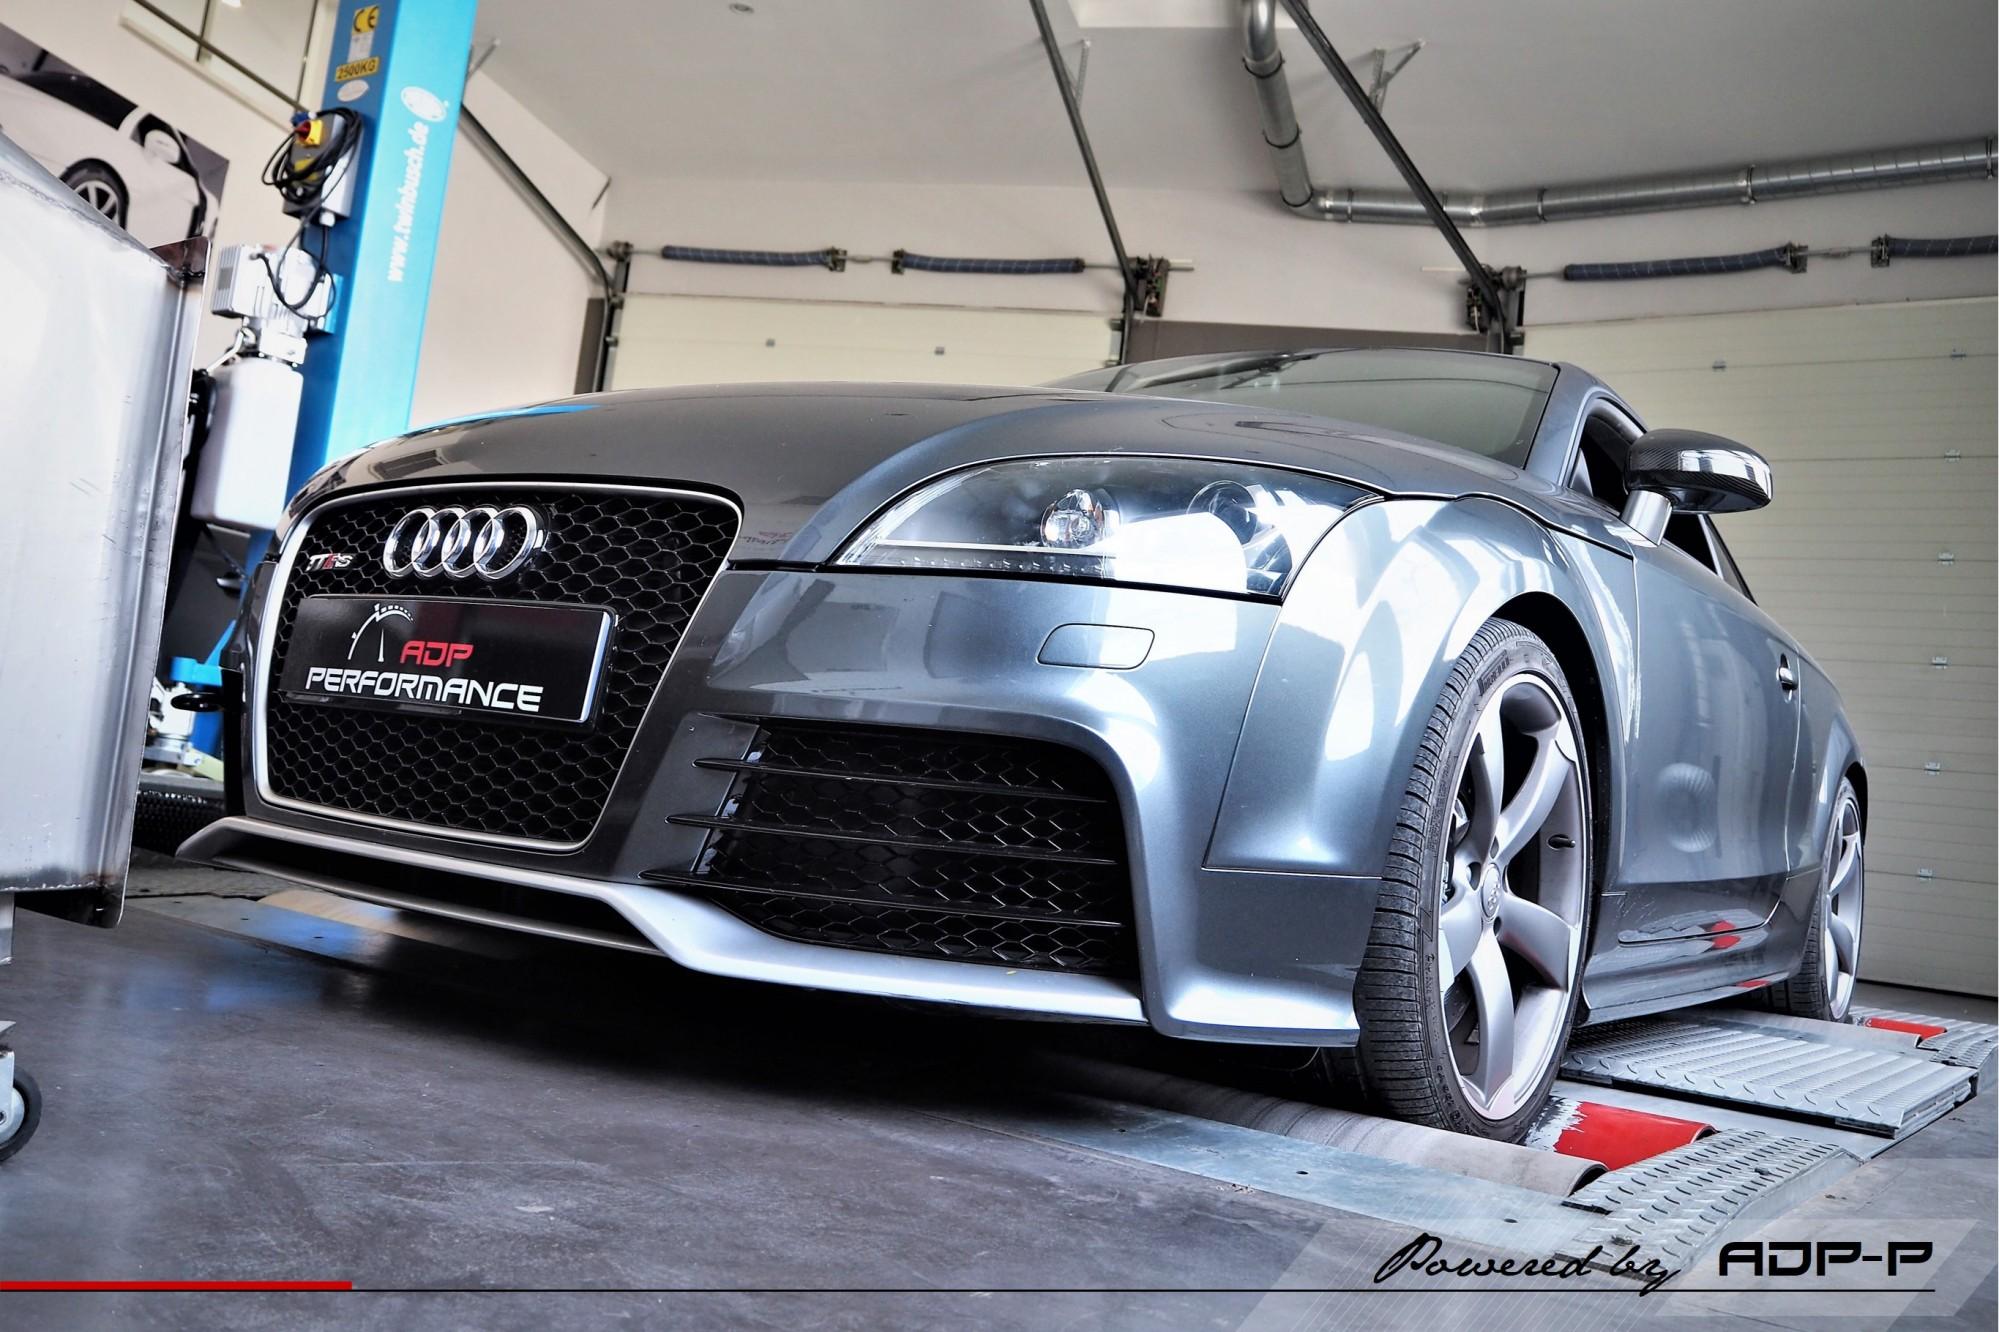 Reprogrammation moteur Stage 2 Aix en Provence - Audi TT RS (8J) 2.5 TFSI 340cv - ADP Performance